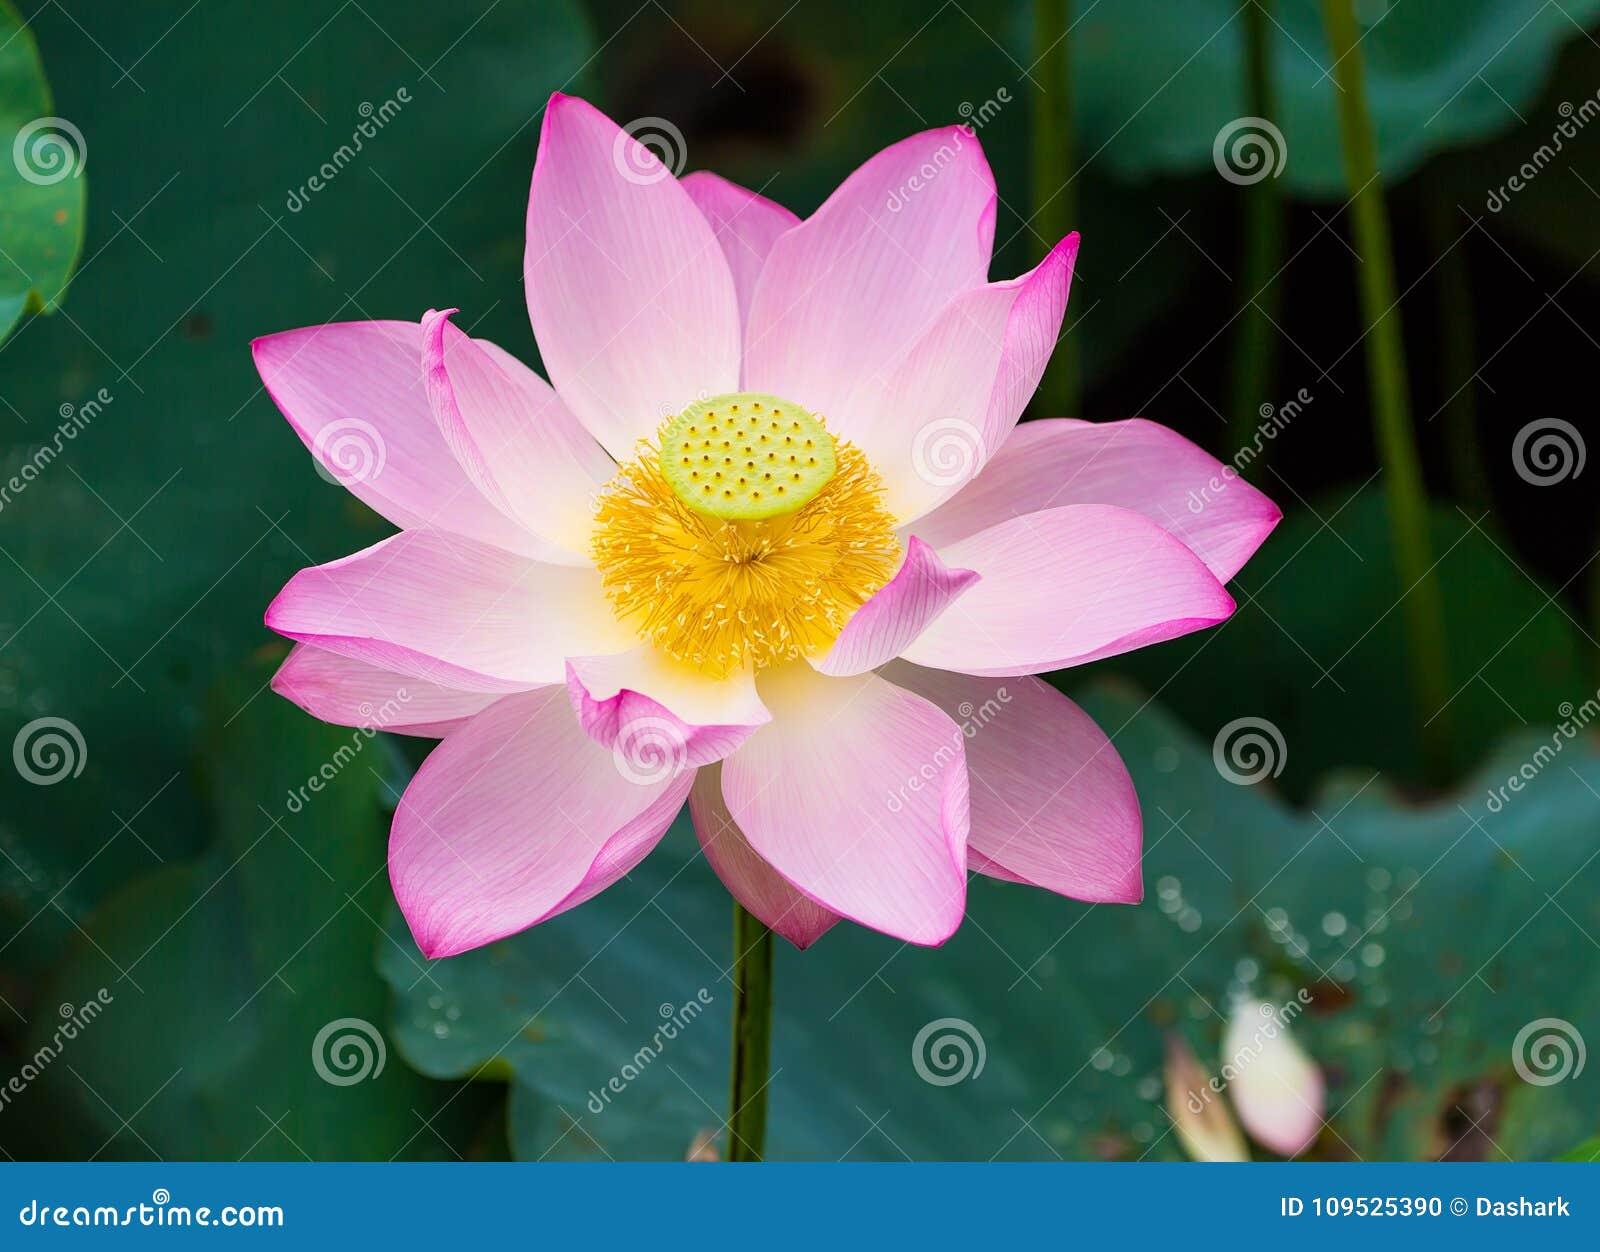 Blooming lotus flower stock photo image of leaf attractive 109525390 download blooming lotus flower stock photo image of leaf attractive 109525390 izmirmasajfo